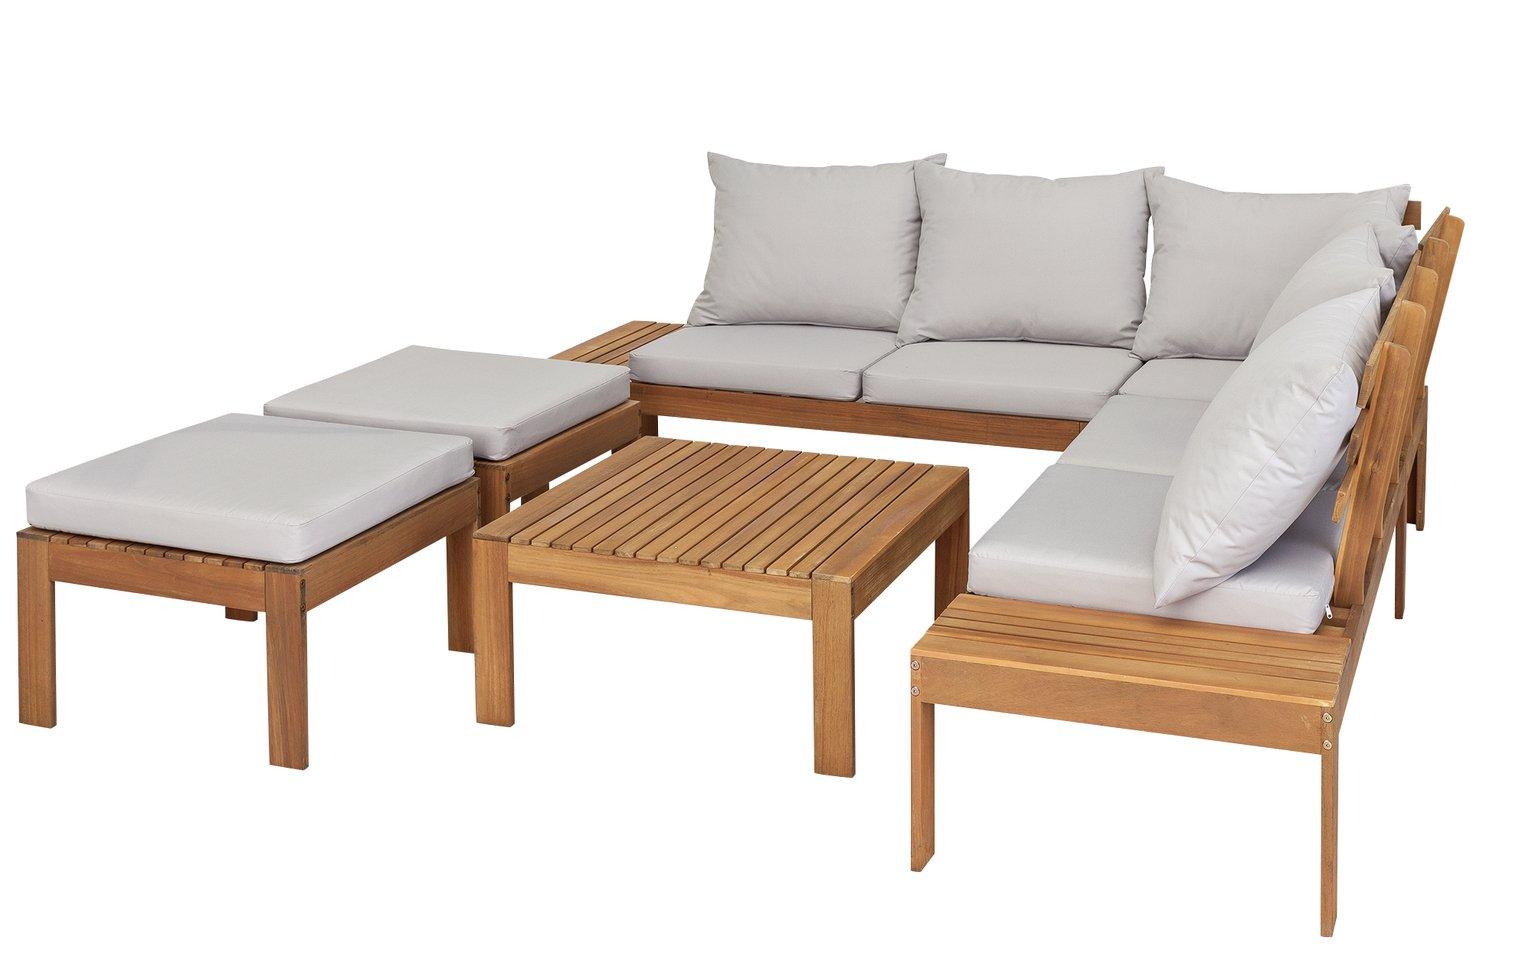 Argos Home 6 Seater Wooden Corner Sofa Set